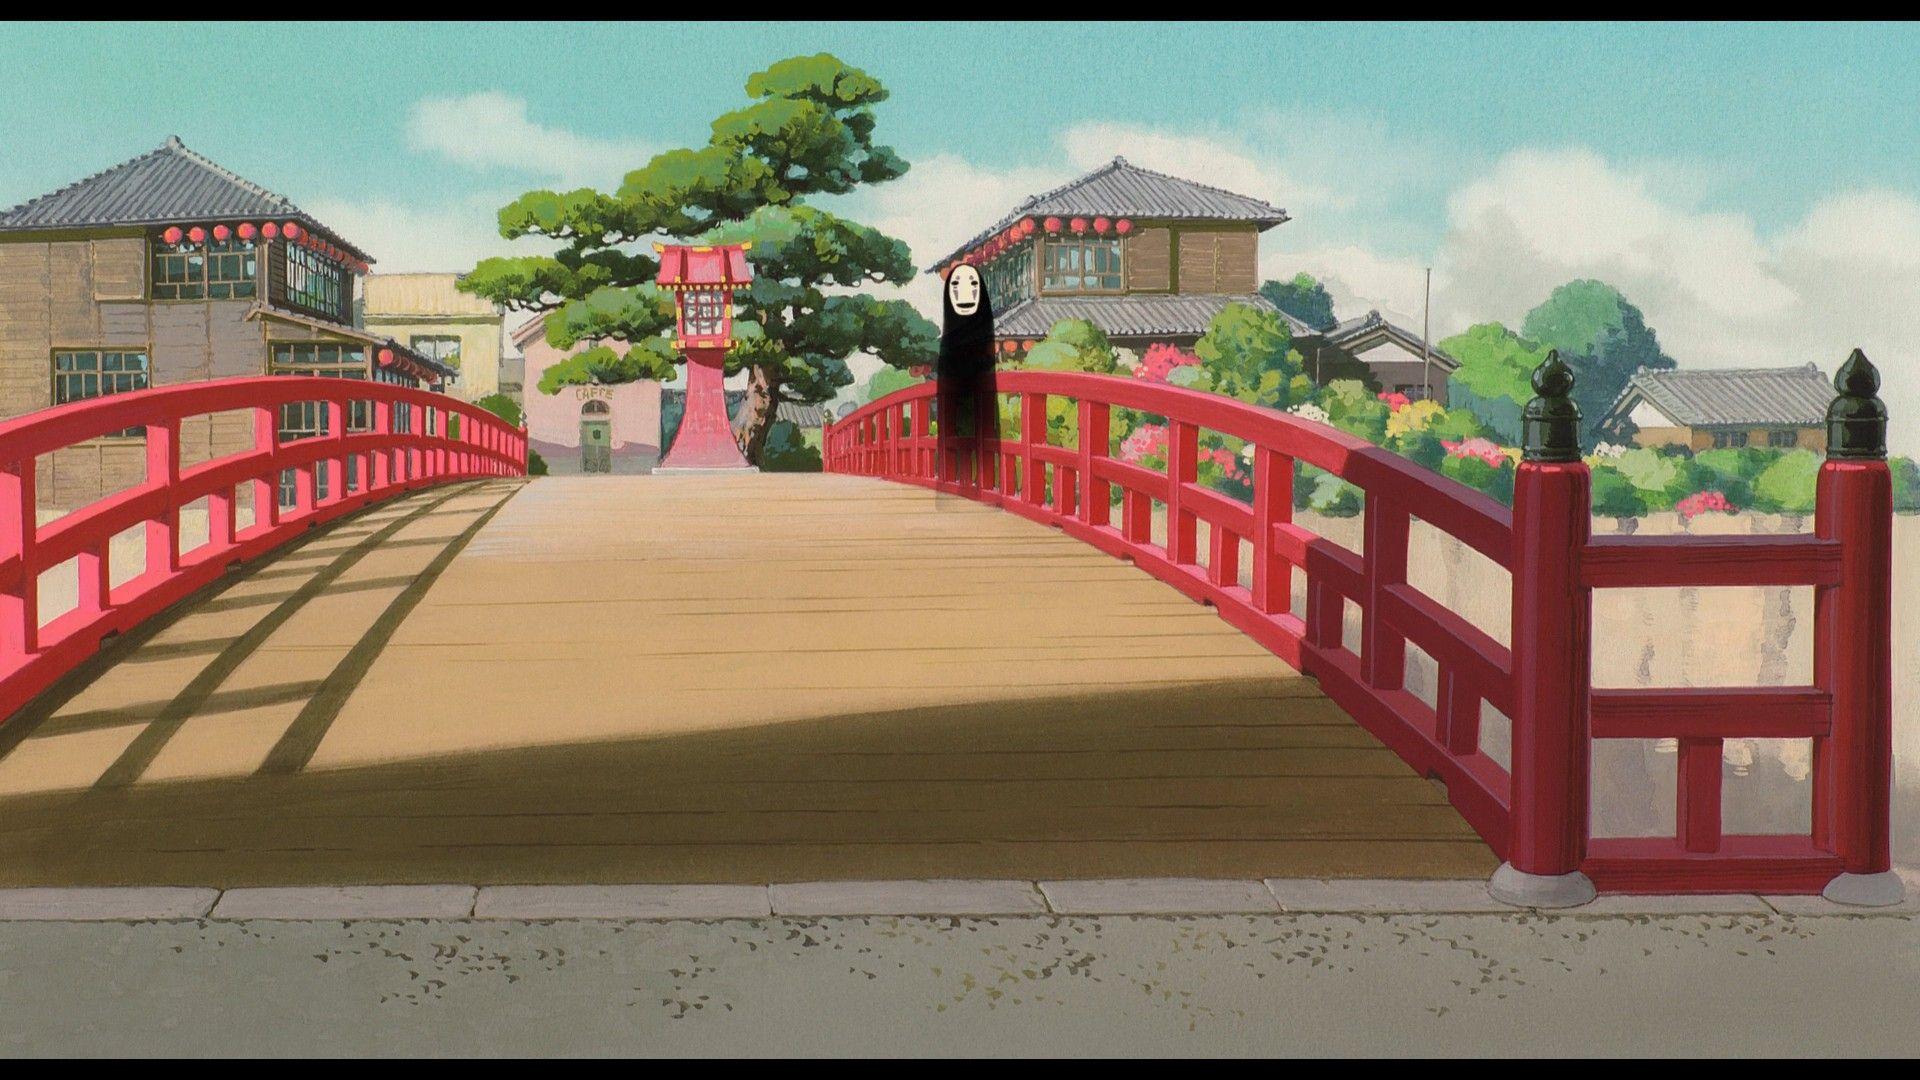 Anime 1920x1080 Studio Ghibli Spirited Away Studio